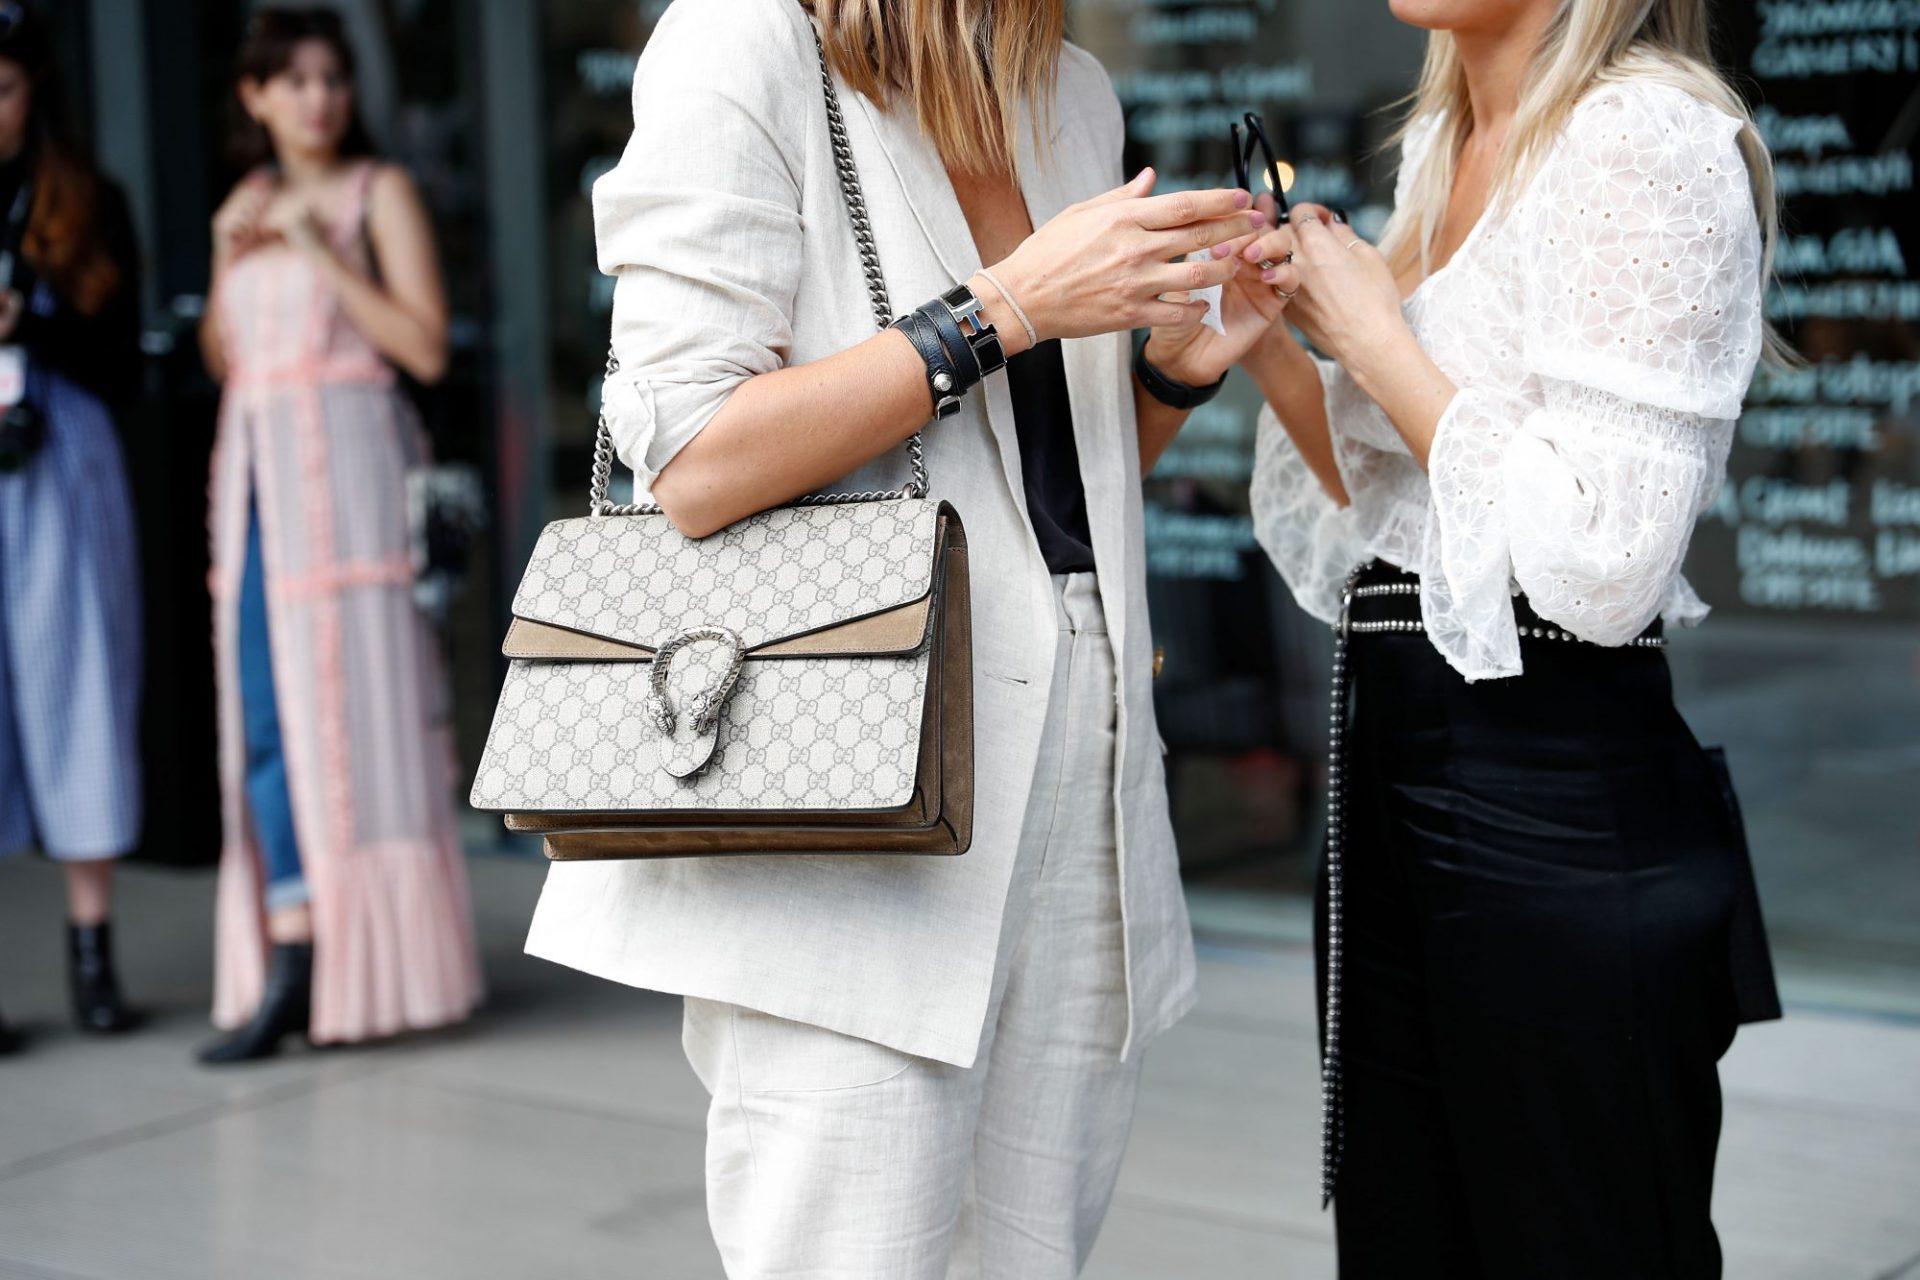 selling purses online